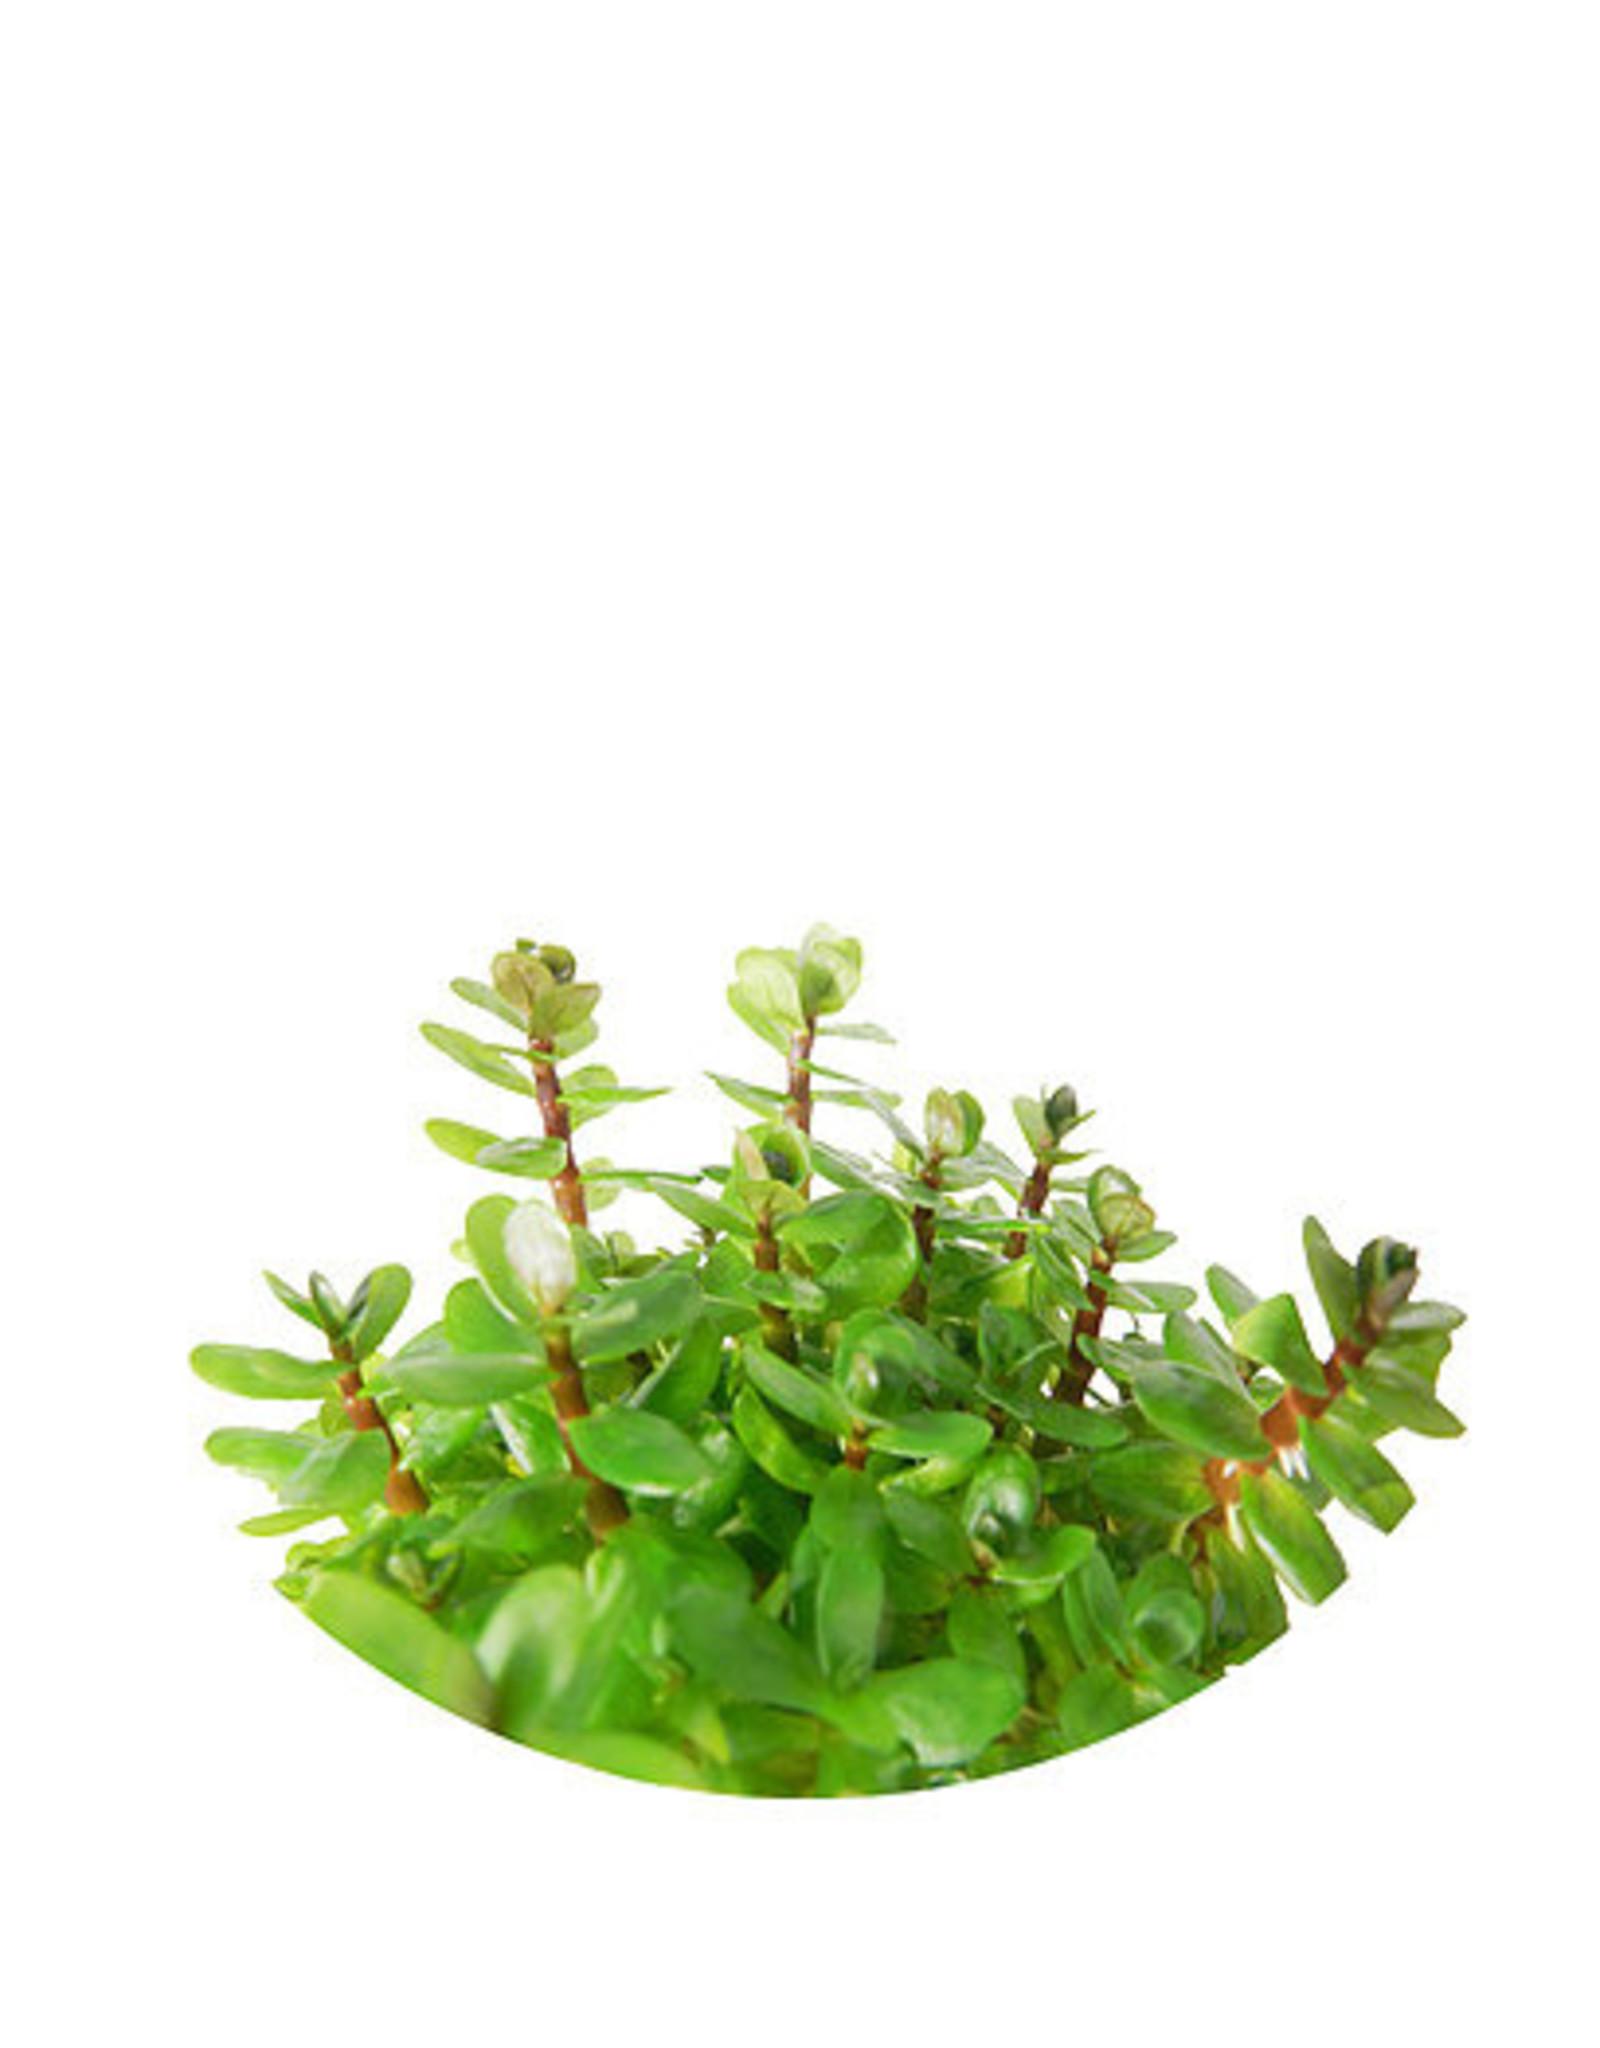 ABC Plants ABC PLANTS - Rotala robustus 'mini' (aka. Ammania bonsai)